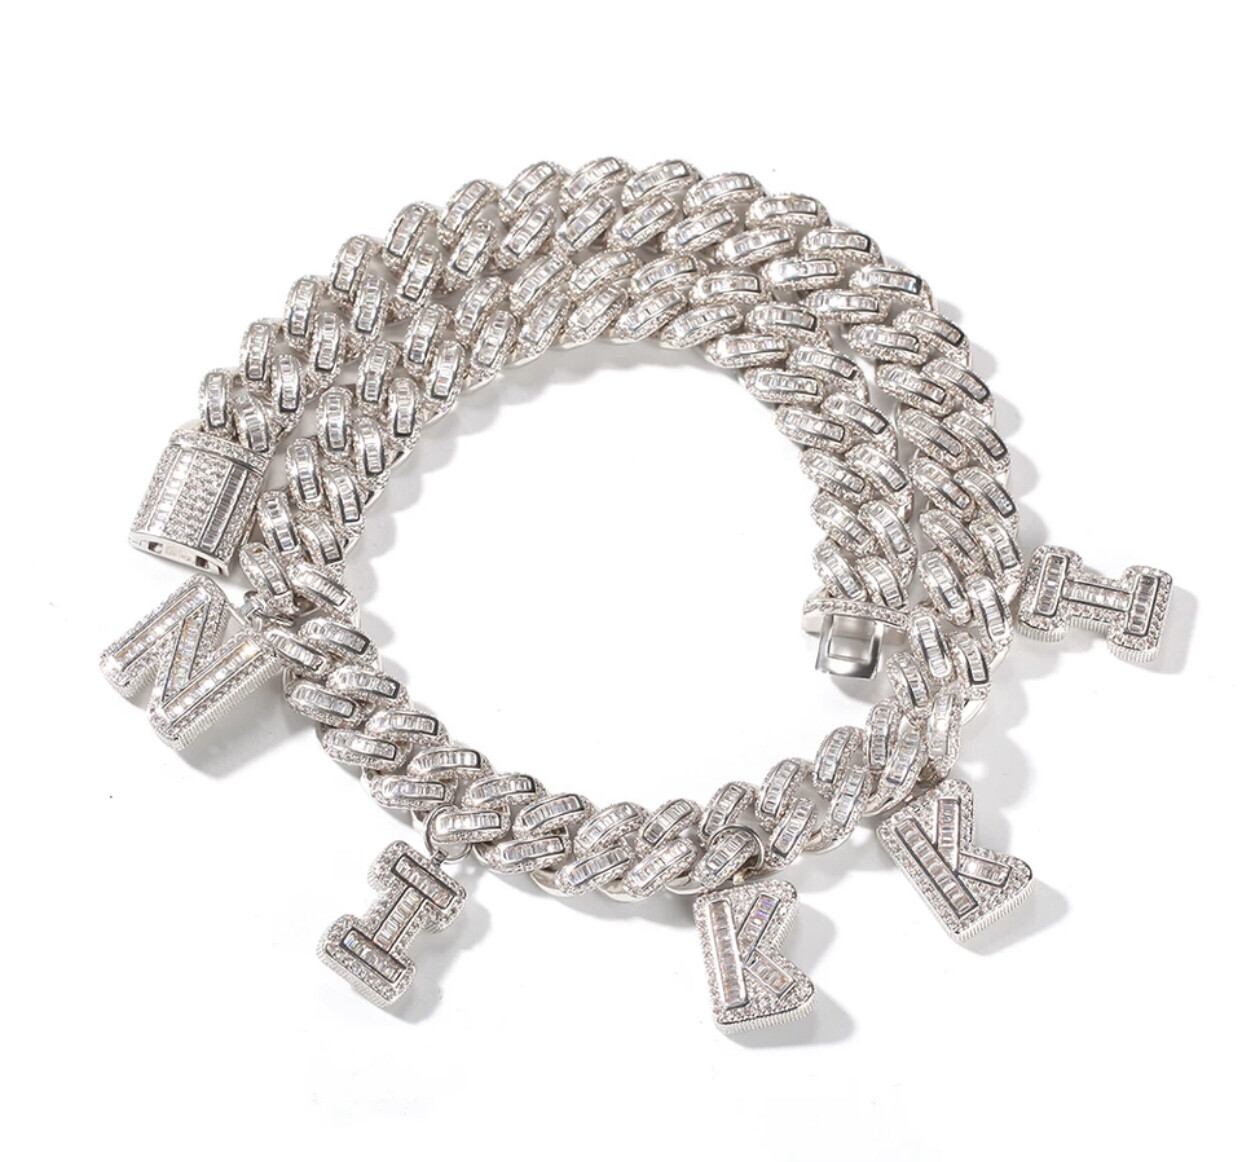 Cuban Link Name Necklace